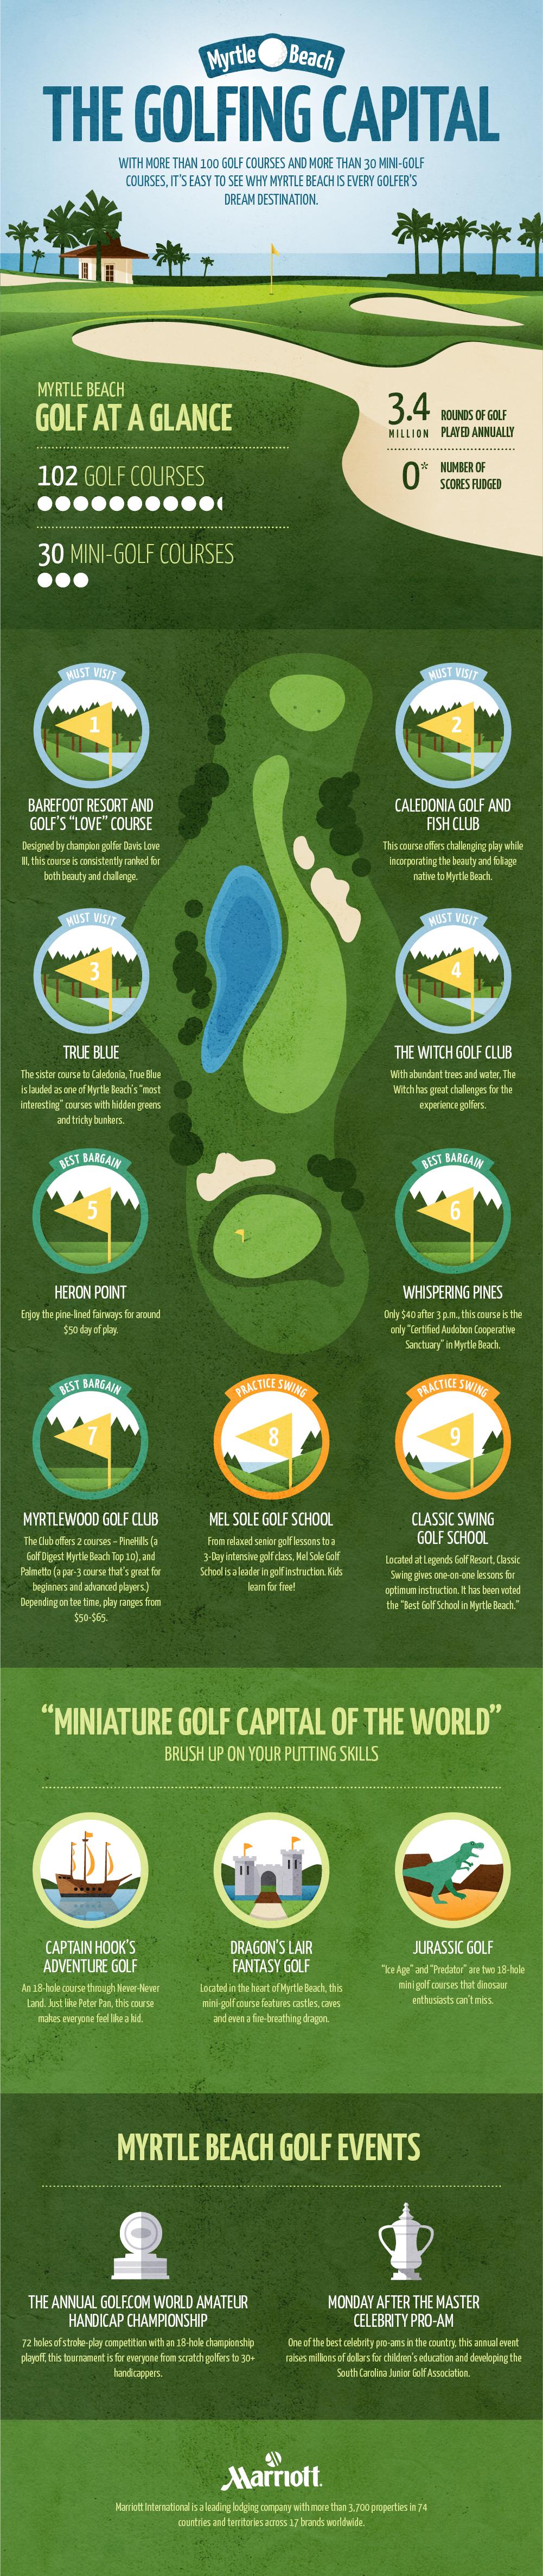 Myrtle Beach: The Golfing Capital